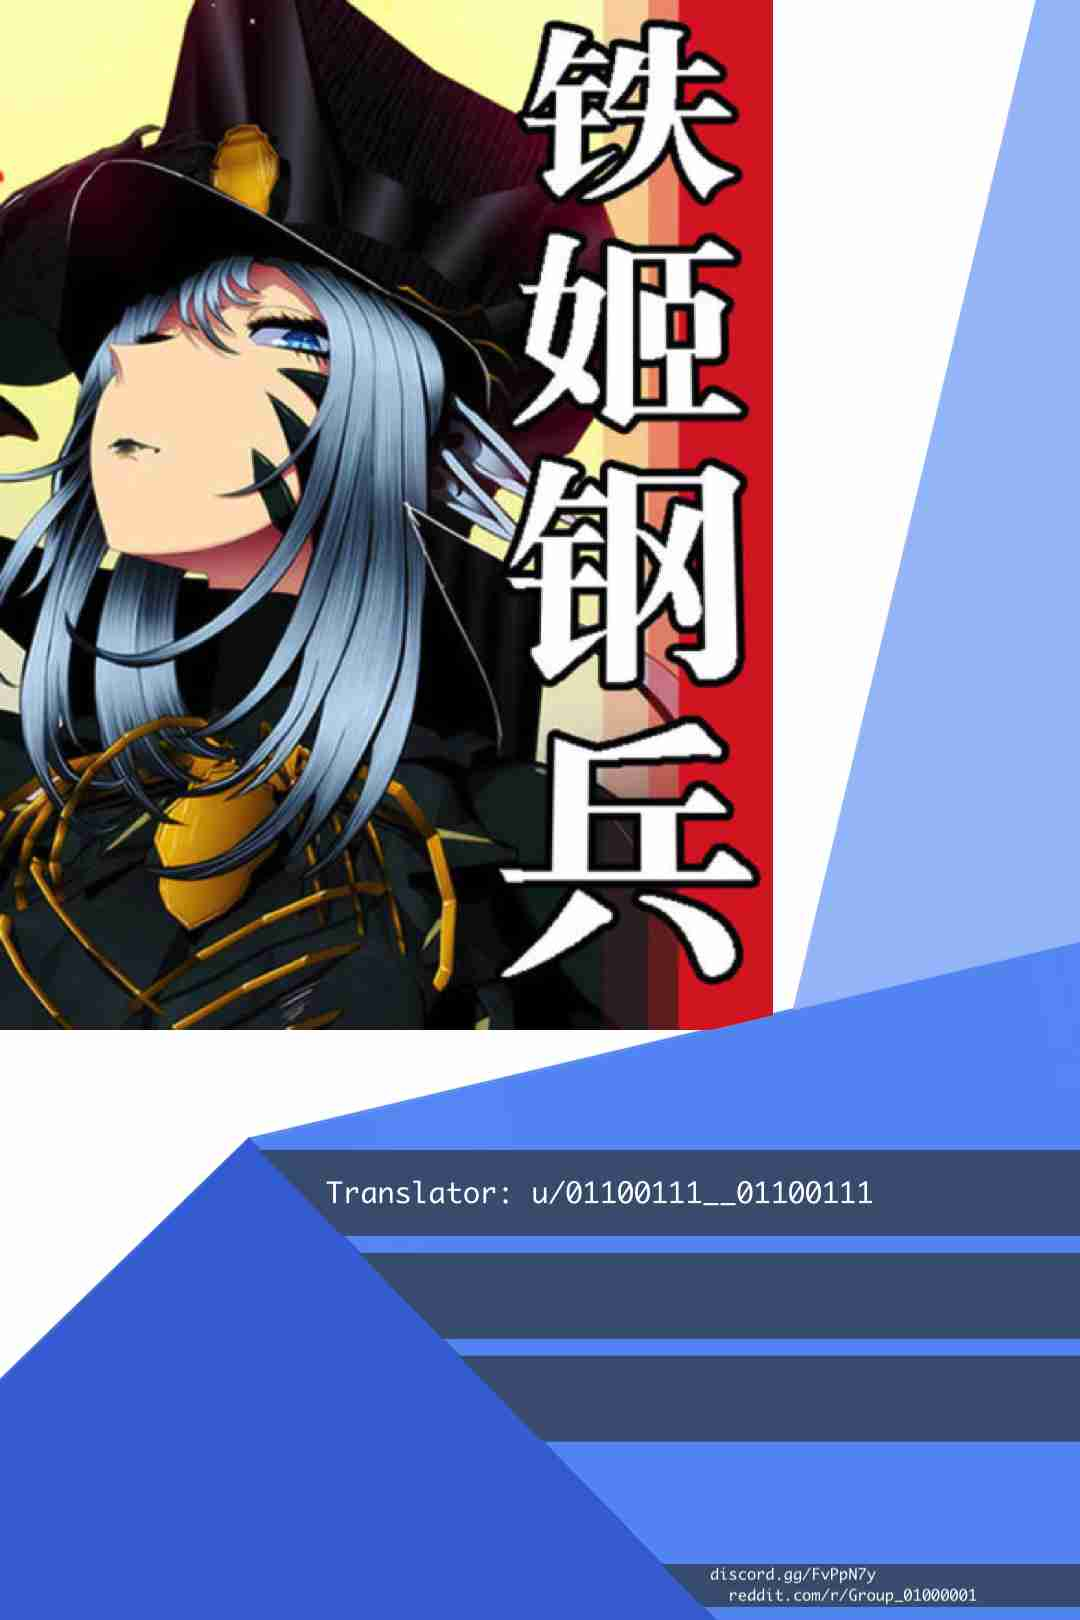 https://manga.mangadogs.com/comics/pic2/59/24443/778619/b578f2a52a0229873fefc2a4b06377fa.jpg Page 1